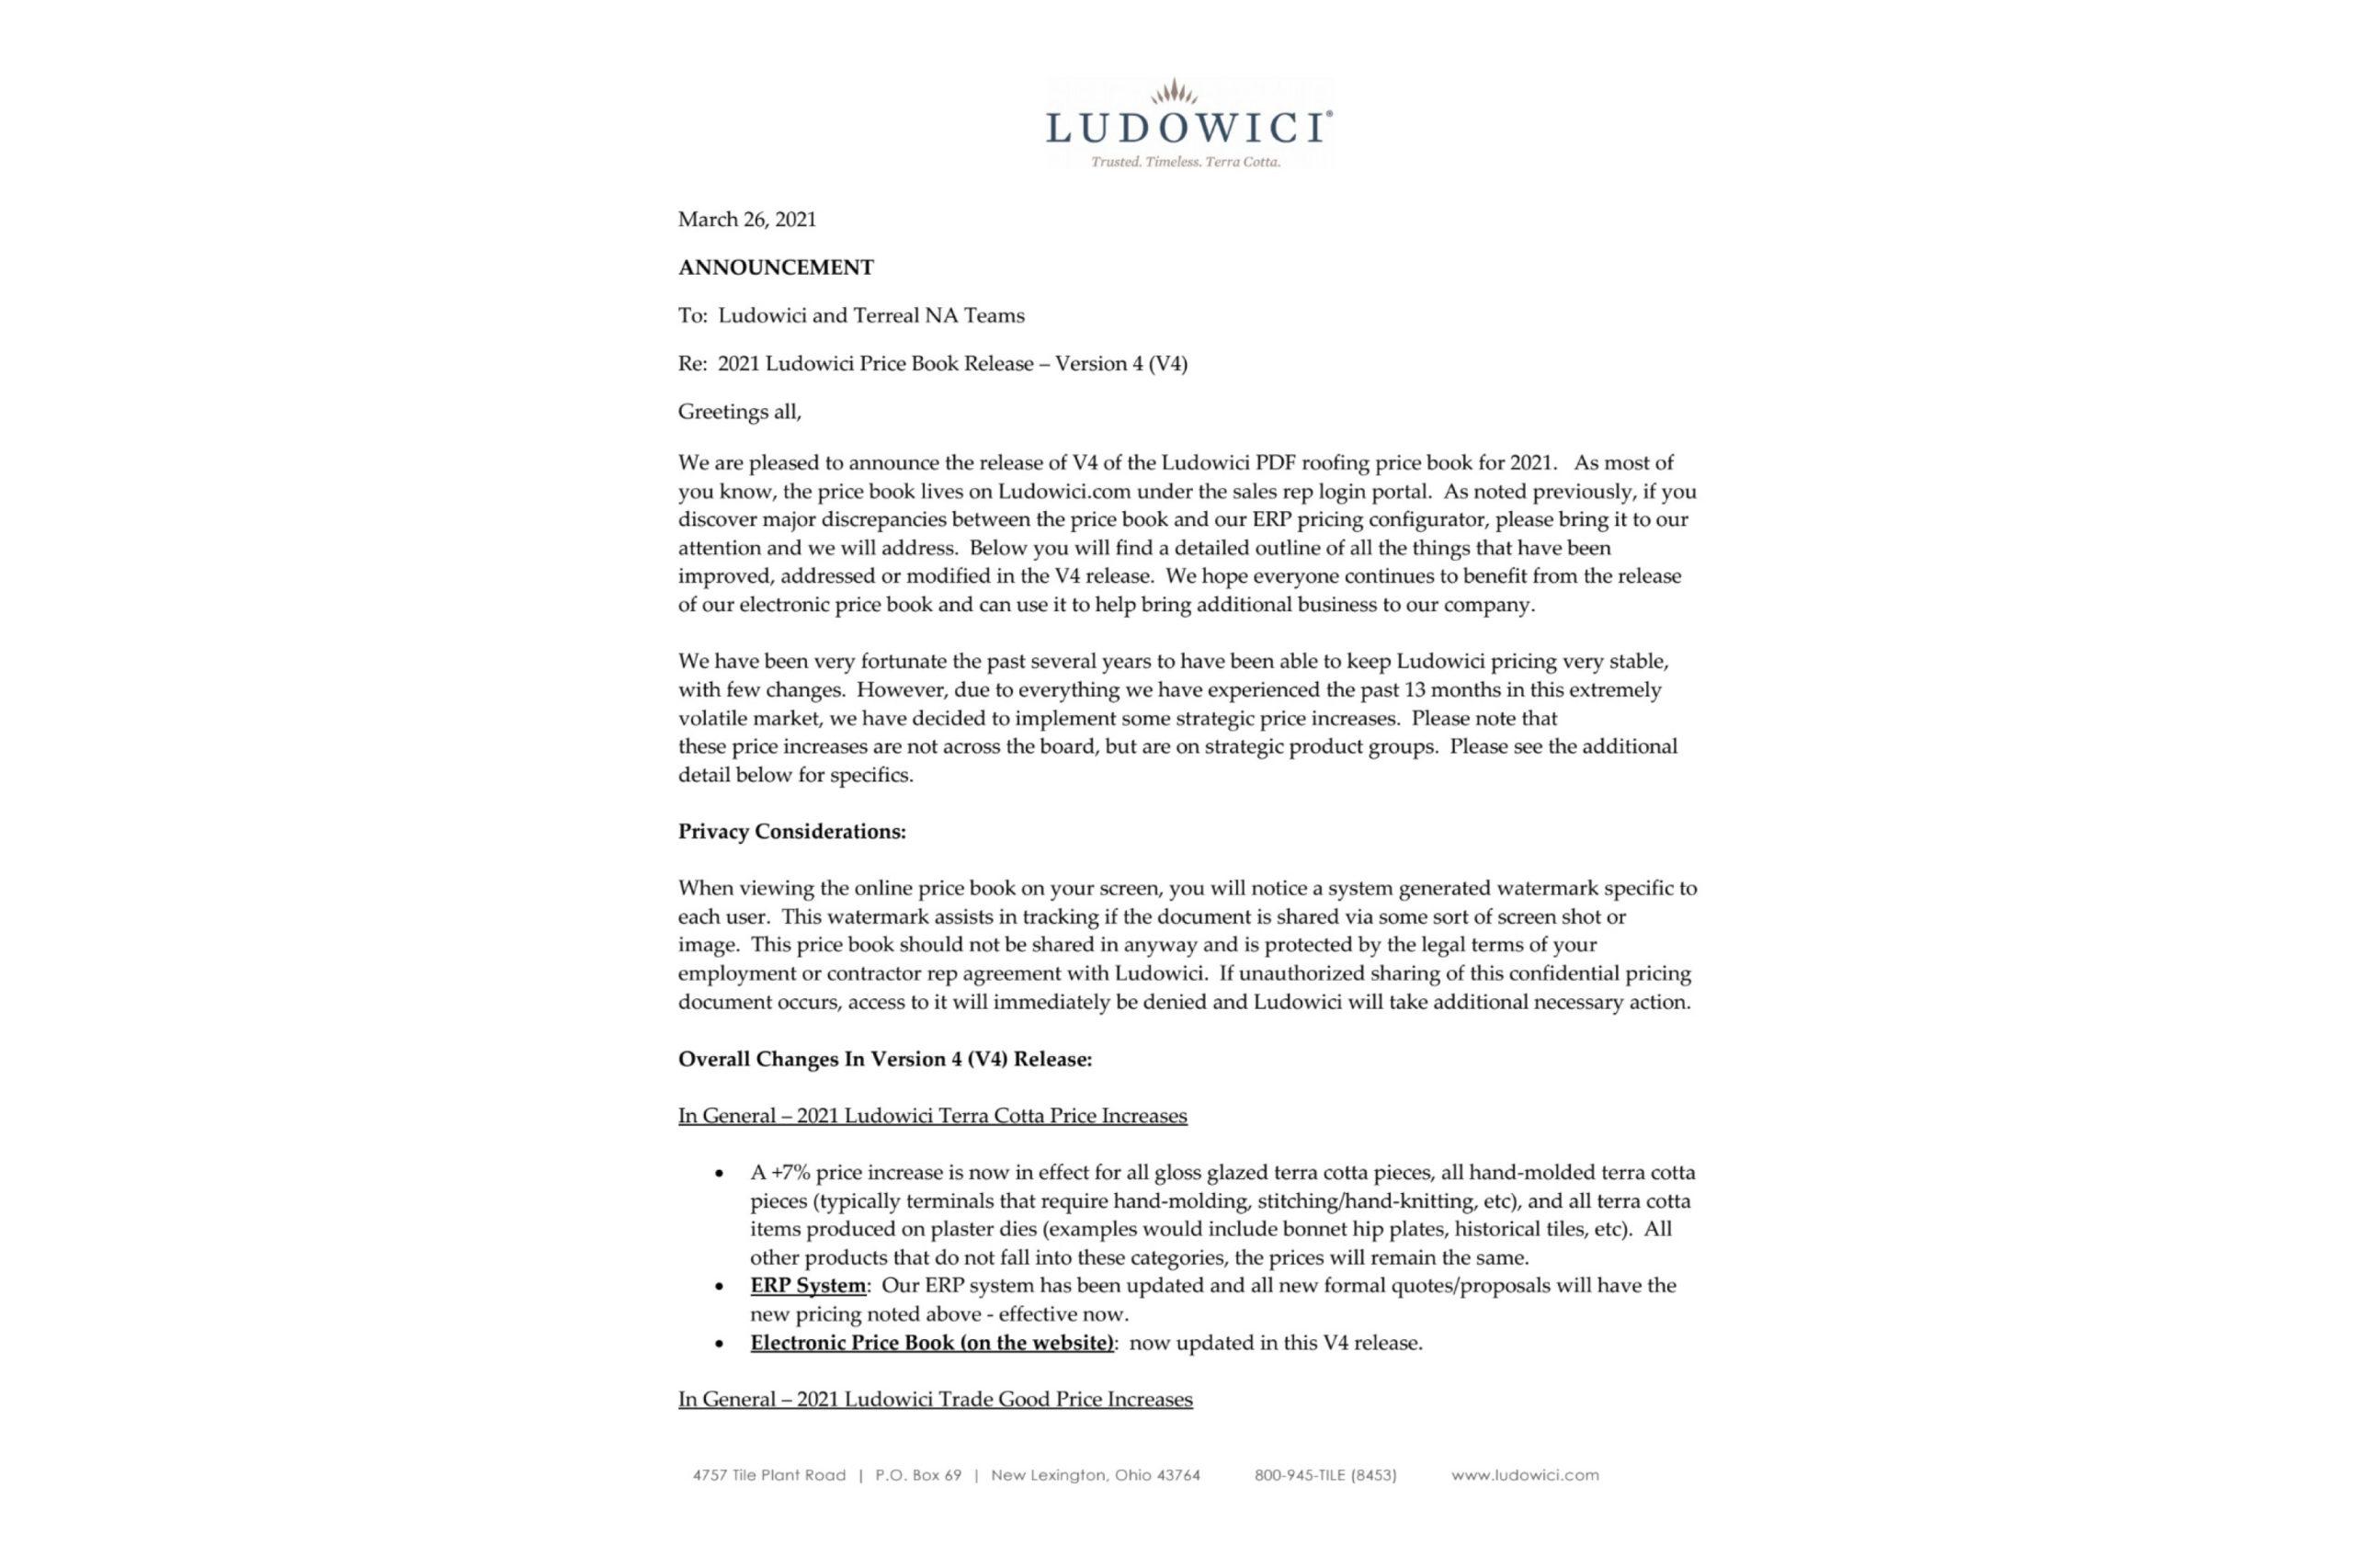 2021 Ludowici Price Book – V4 Release Info